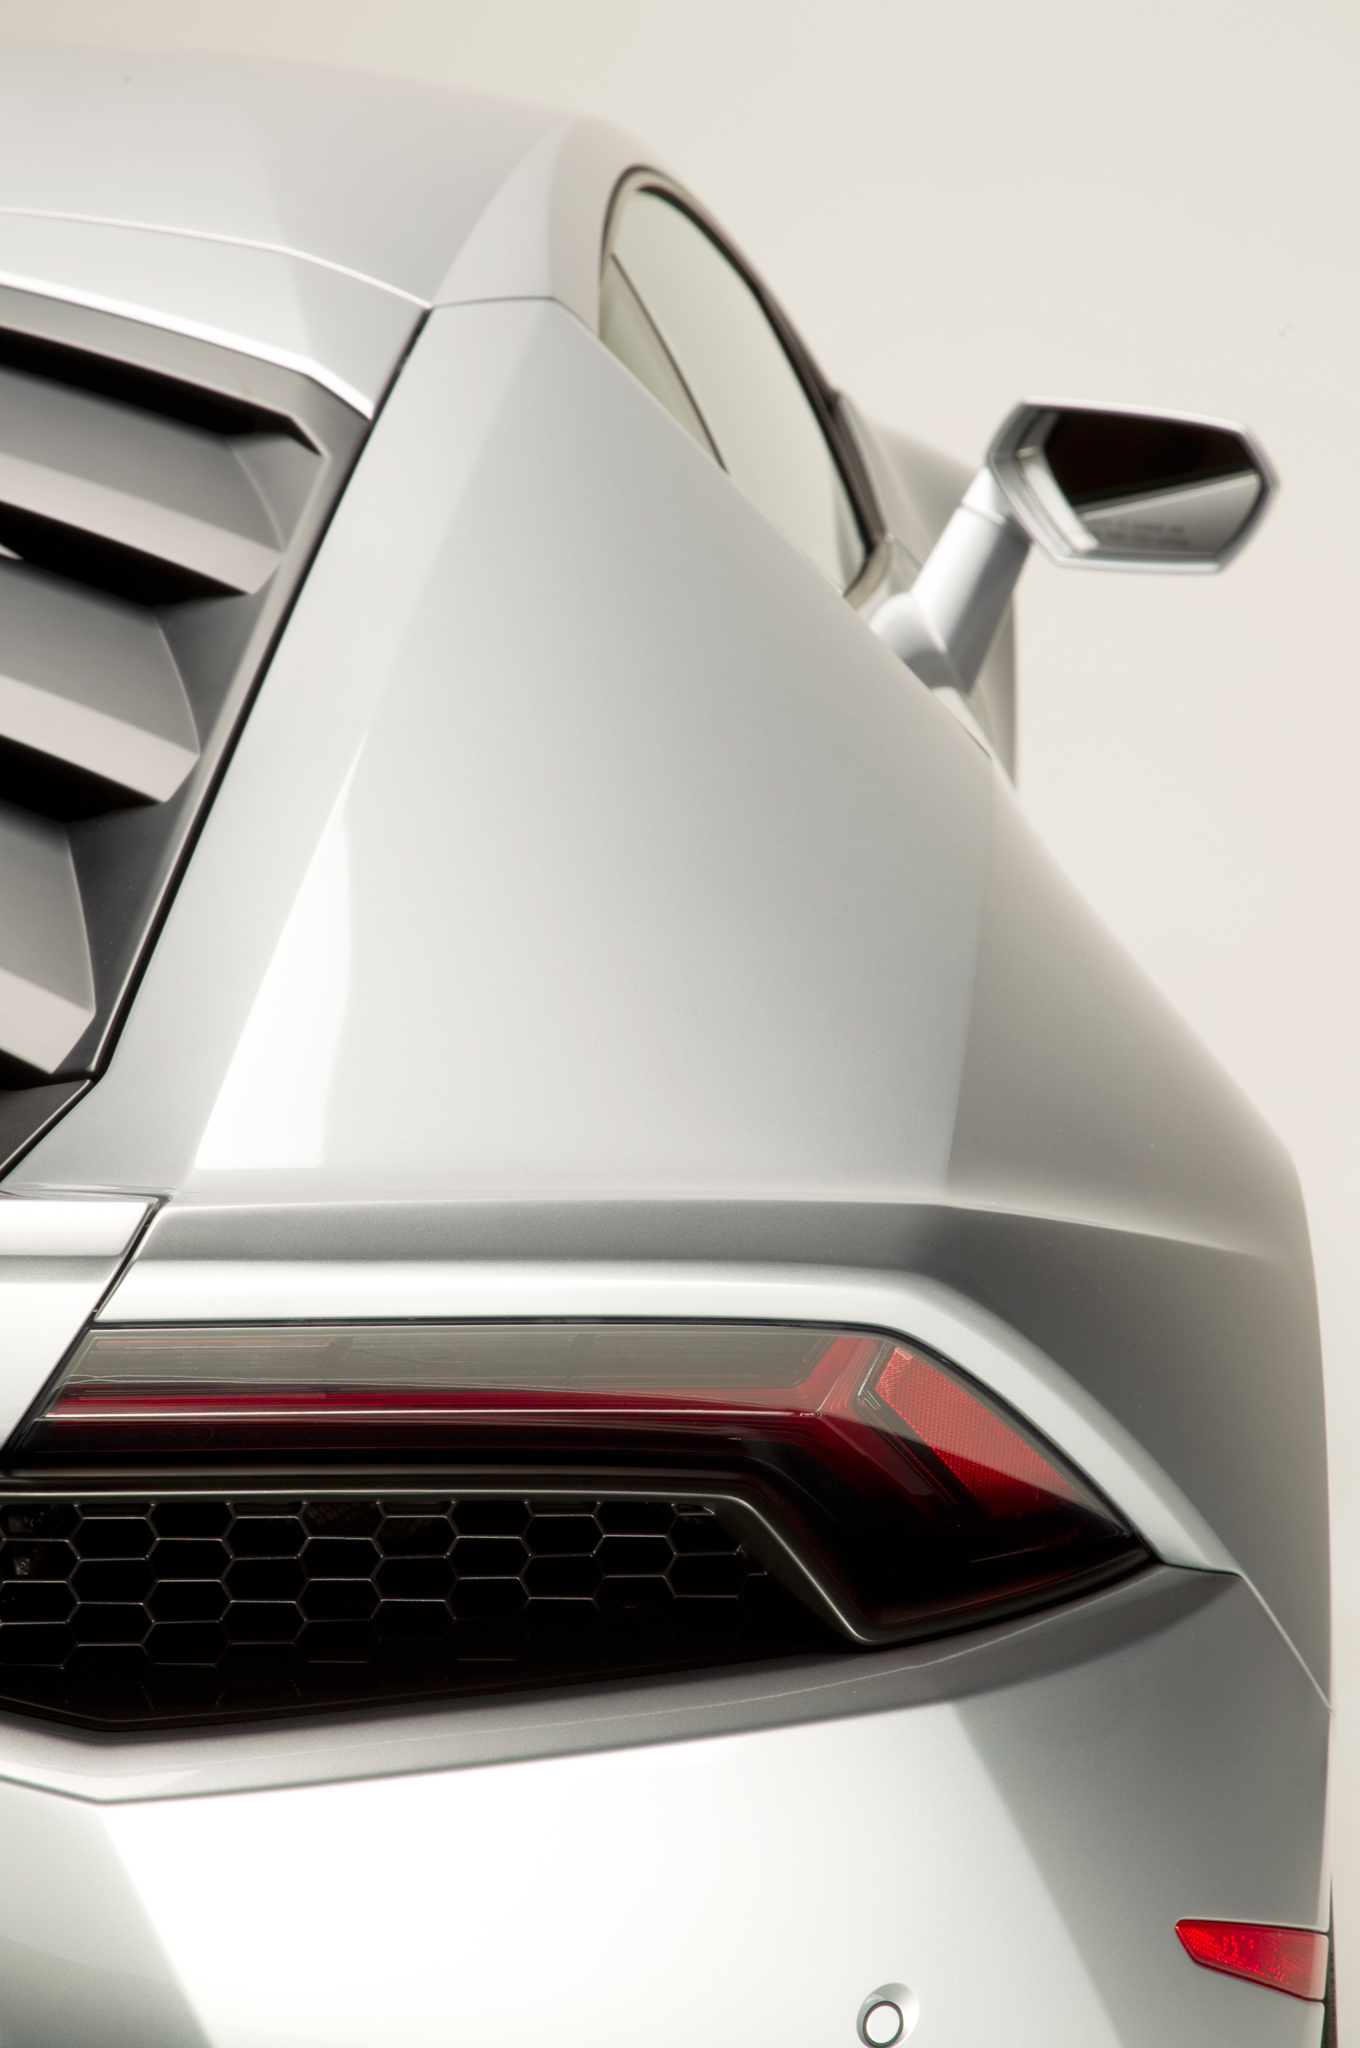 http—image.motortrend.com-f-roadtests-exotic-1312_2015_lamborghini_huracan_first_look-59412074-2015-Lamborghini-Huracan-rear-taillight-03